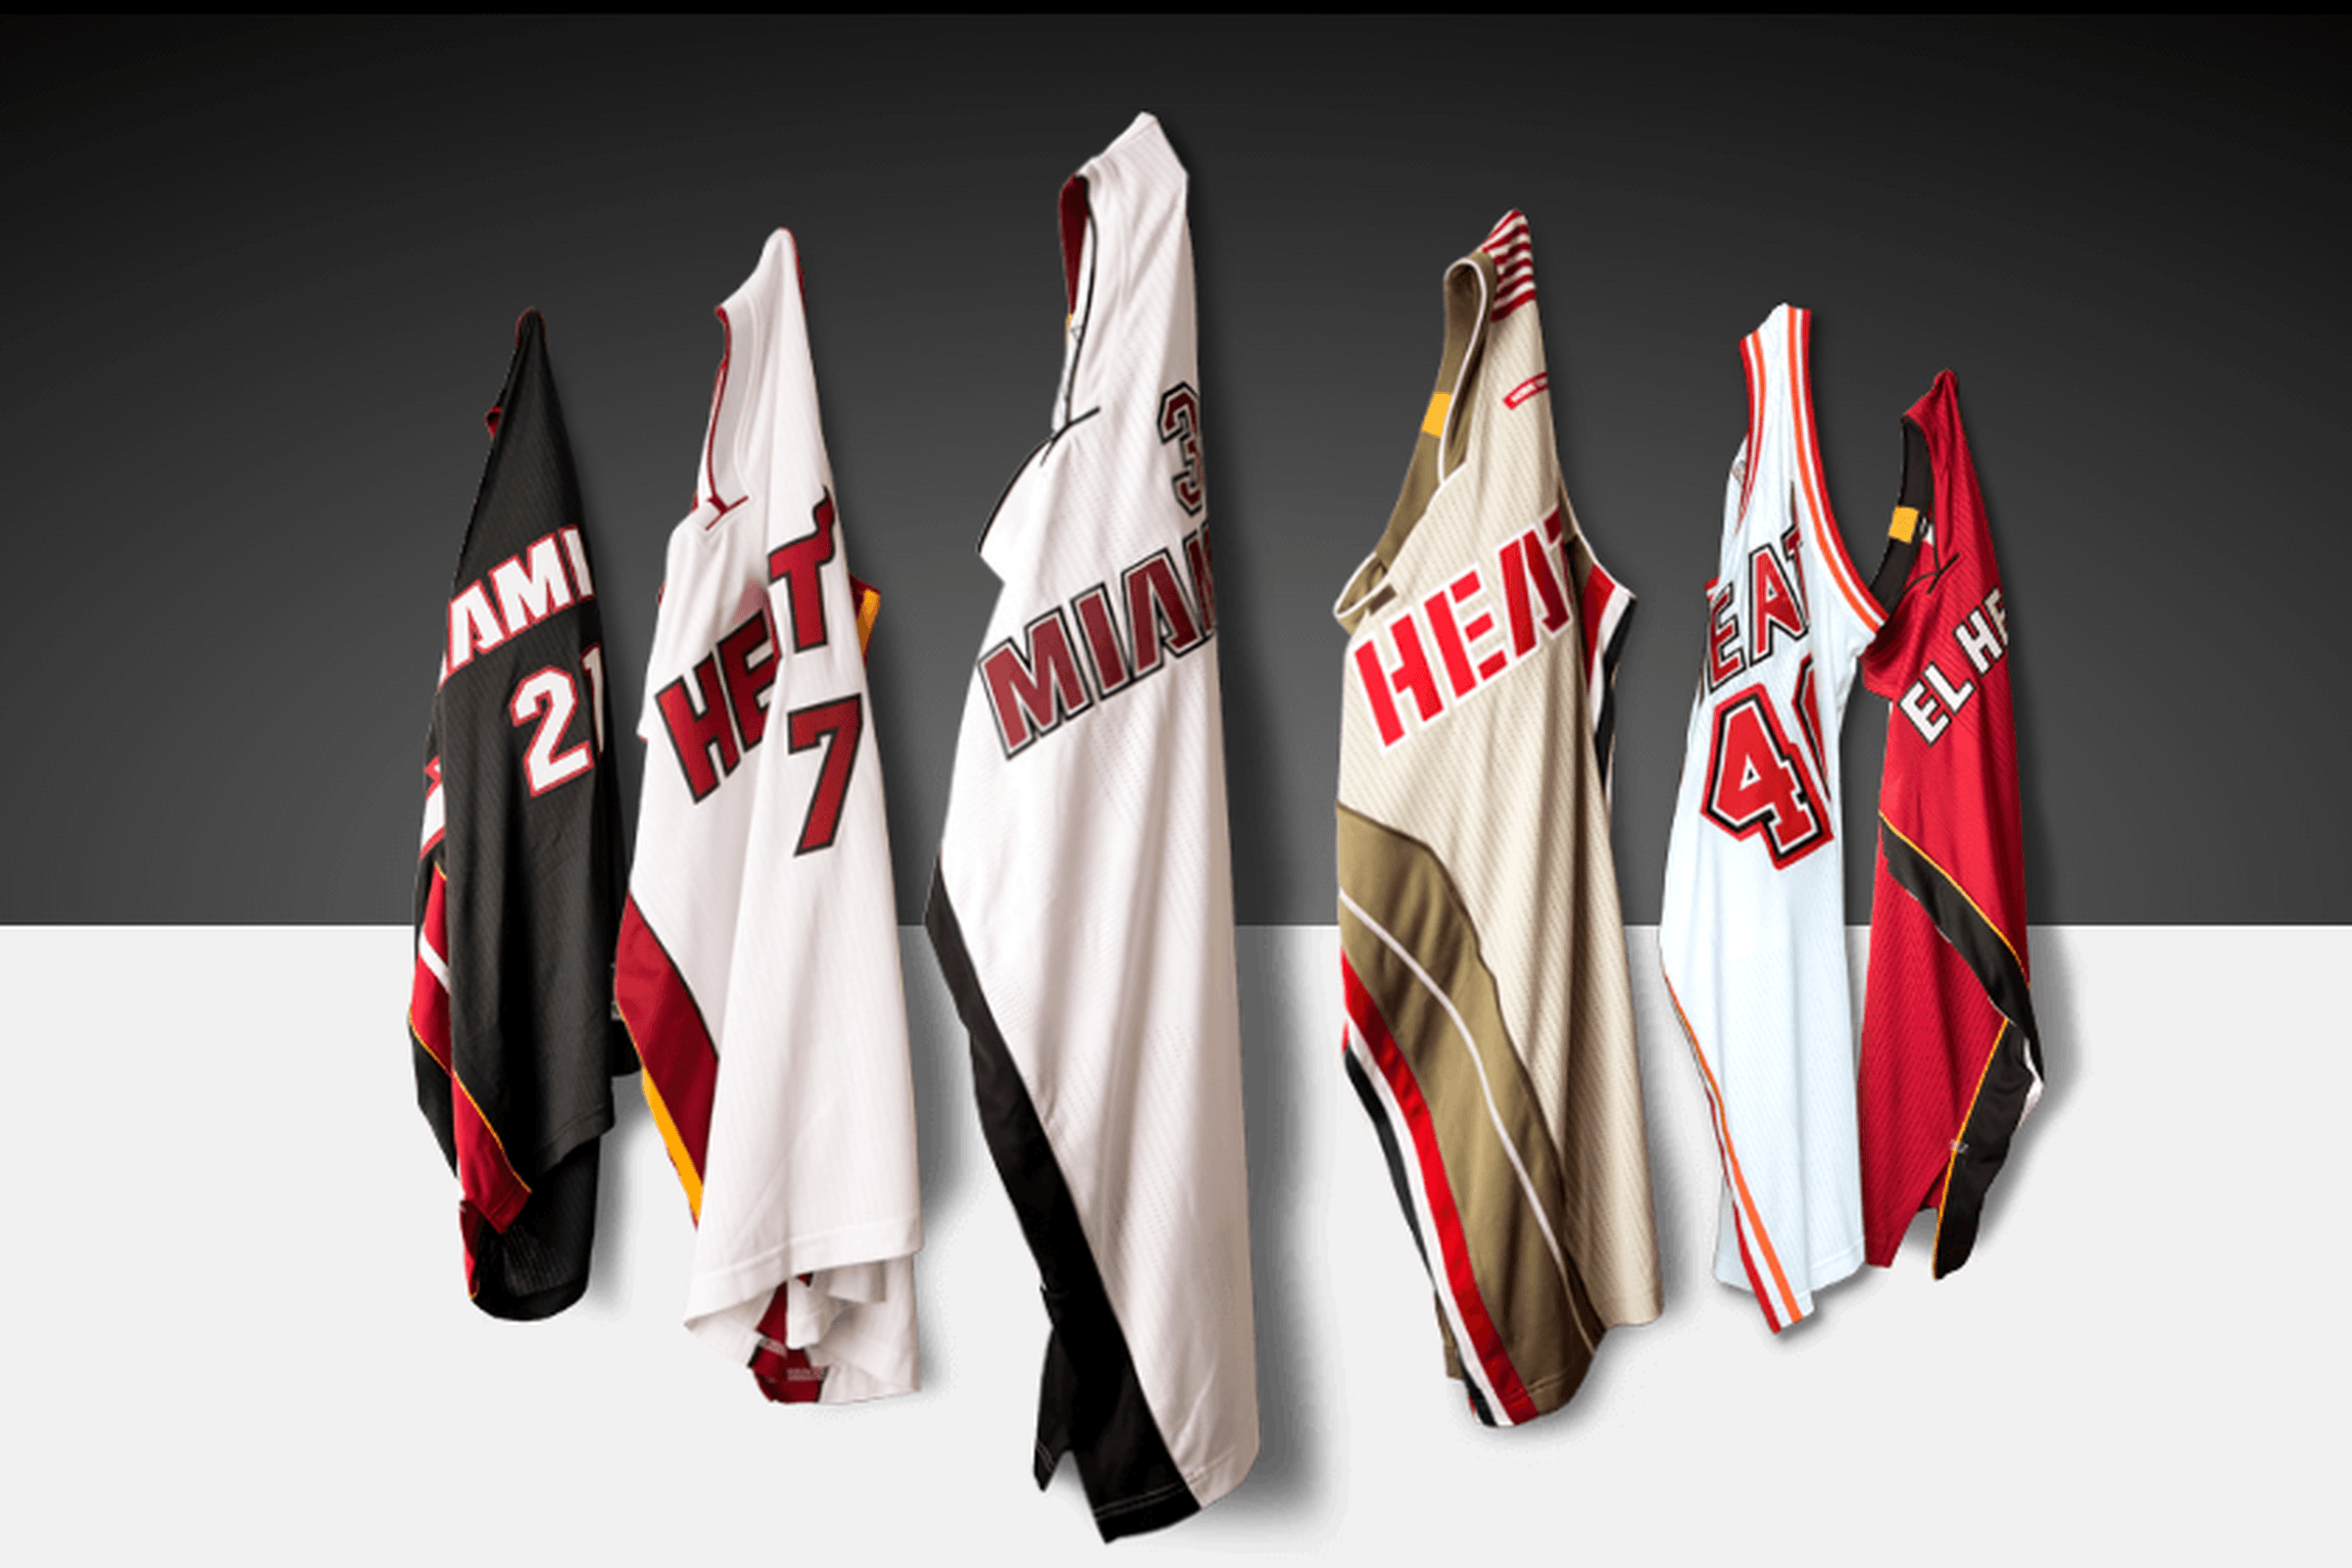 NBA Miami Heat Uniform wallpaper 2018 in Basketball